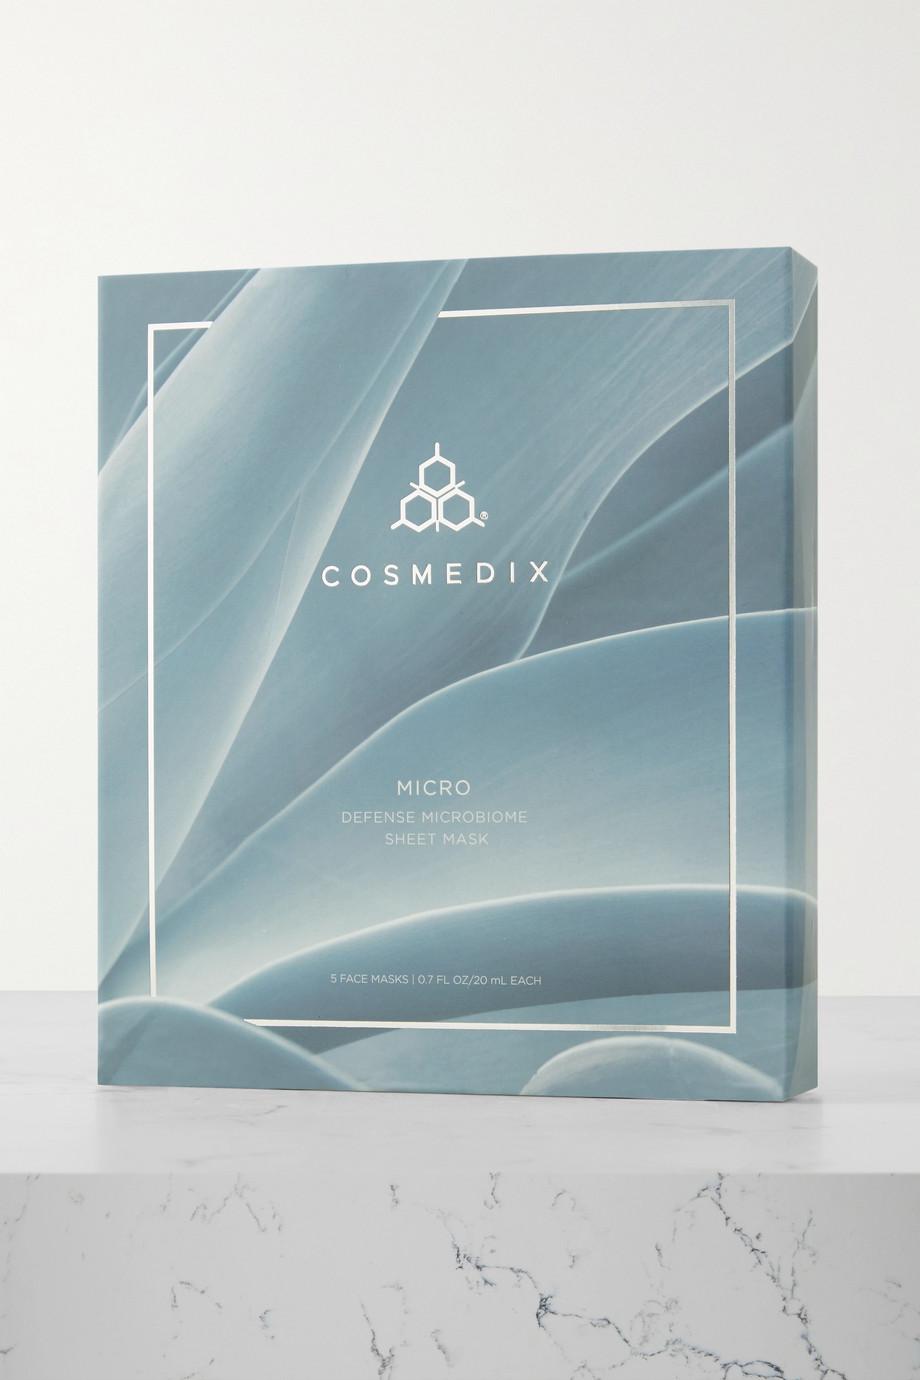 Cosmedix Micro Defense Microbiome Sheet Mask x 5 – 5 Gesichtsmasken